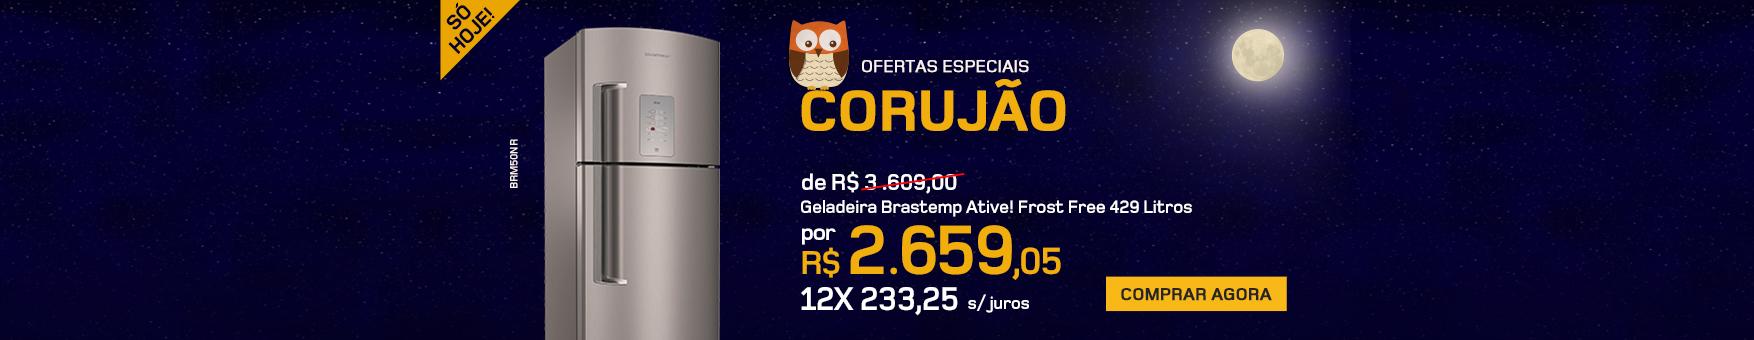 Corujão 1